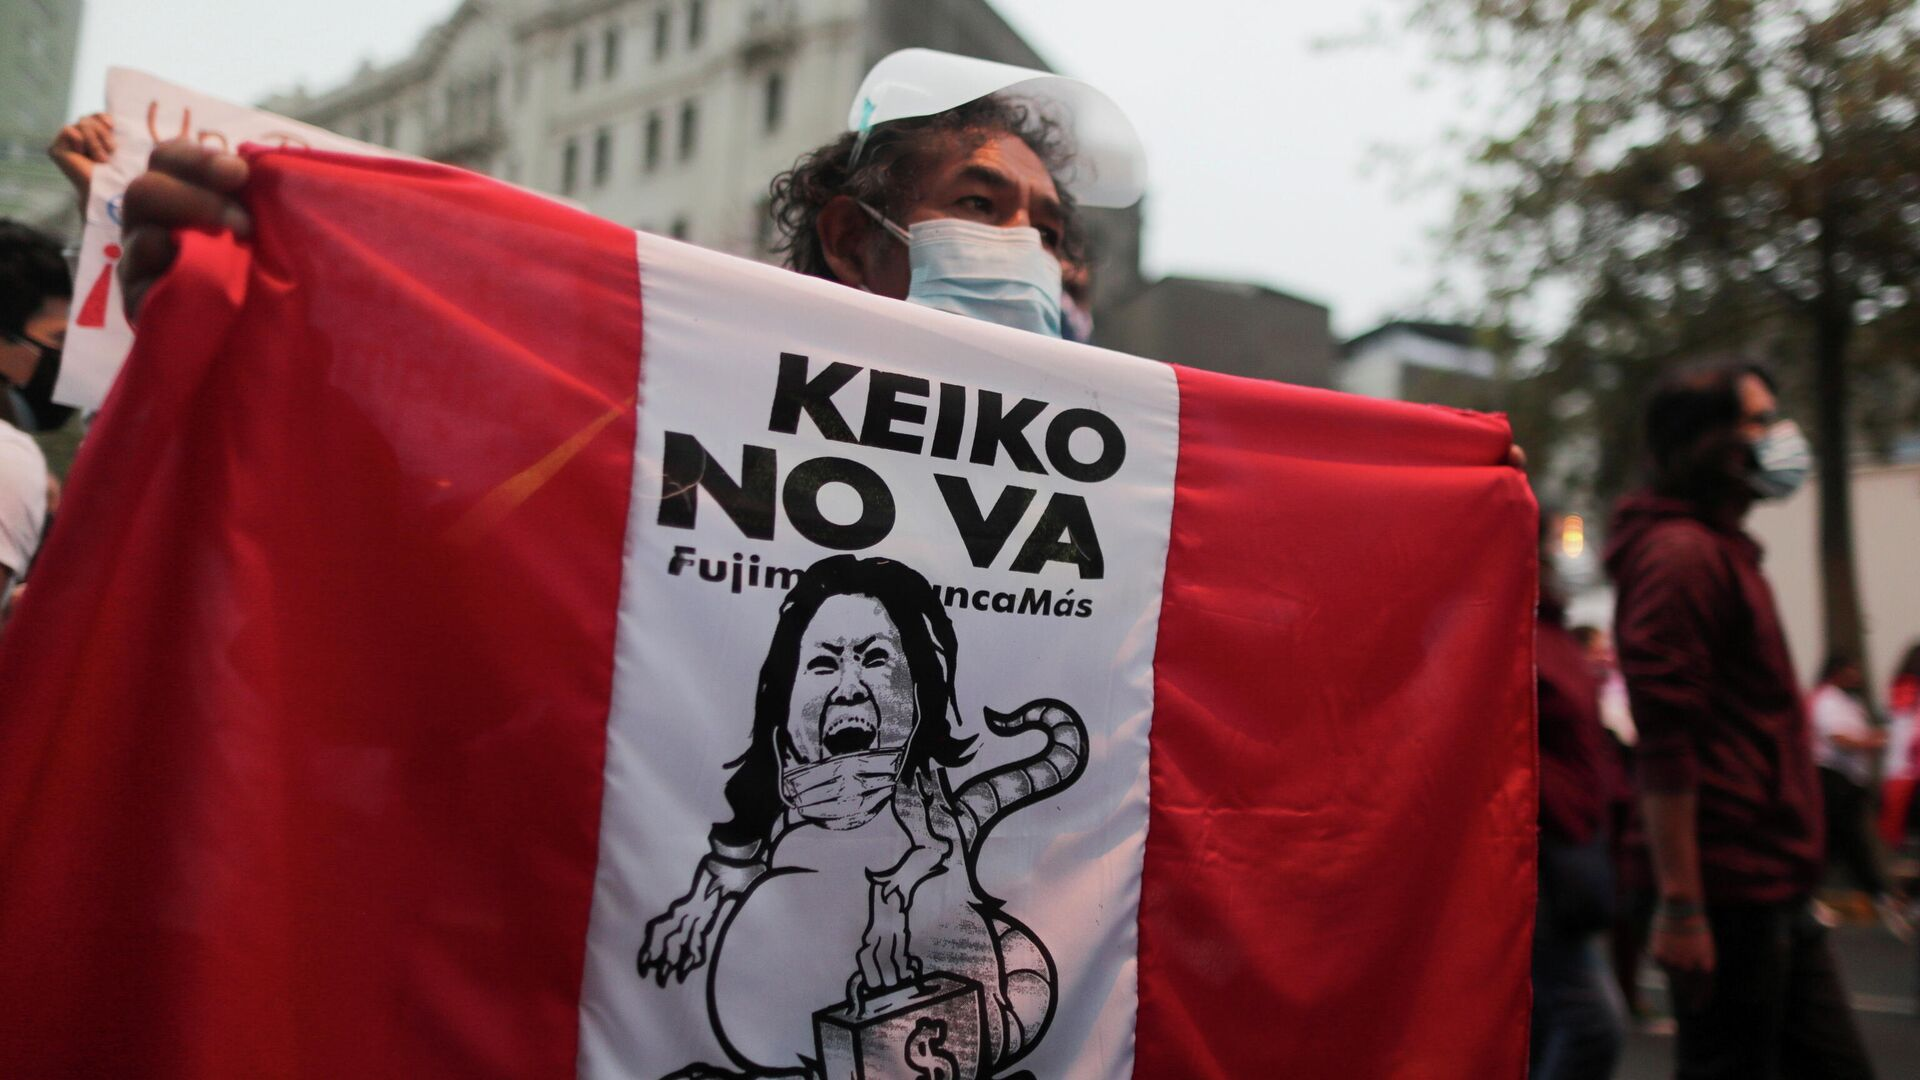 Marcha contra candidatura de Keiko Fujimori (Archivo) - Sputnik Mundo, 1920, 24.06.2021